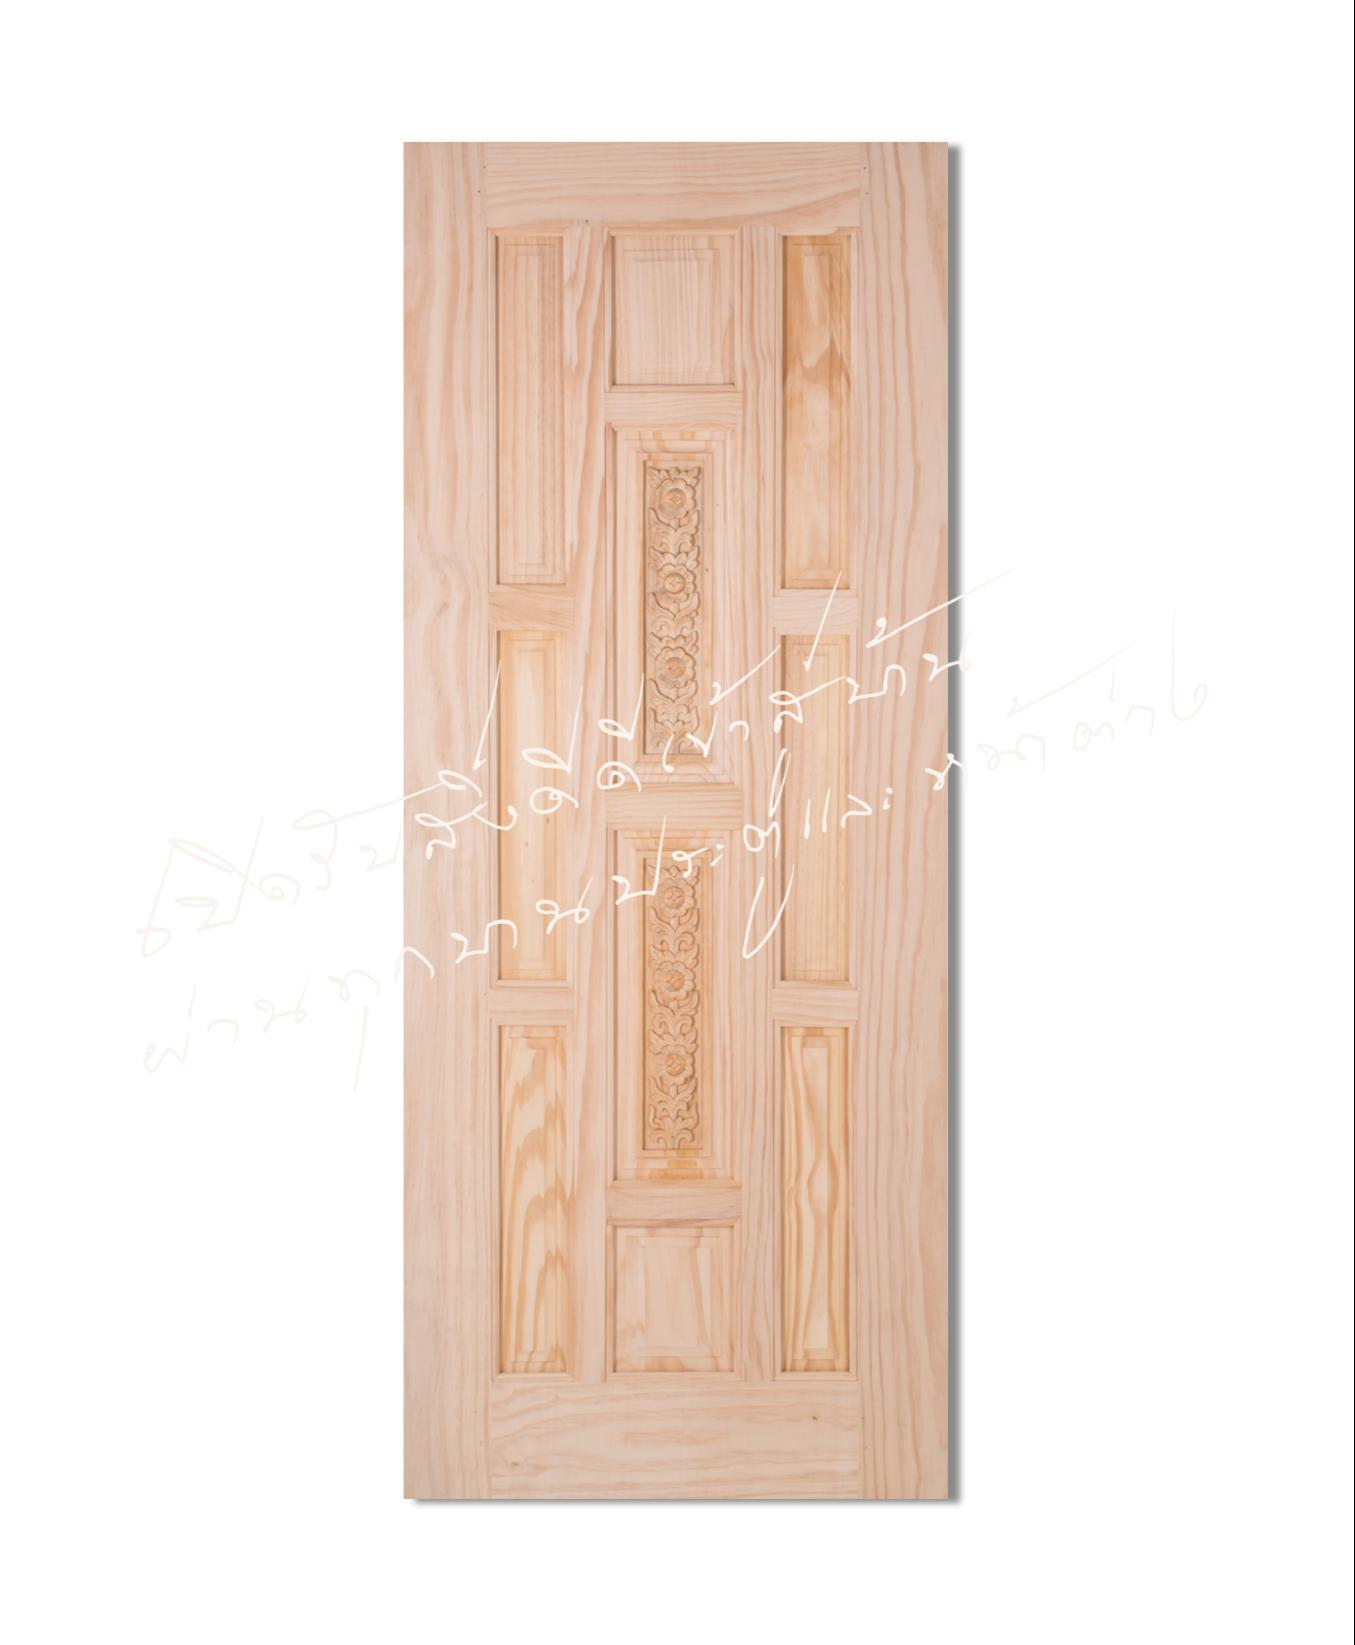 L120 ประตูไม้จริง ไม้สนนิวซีแลนด์